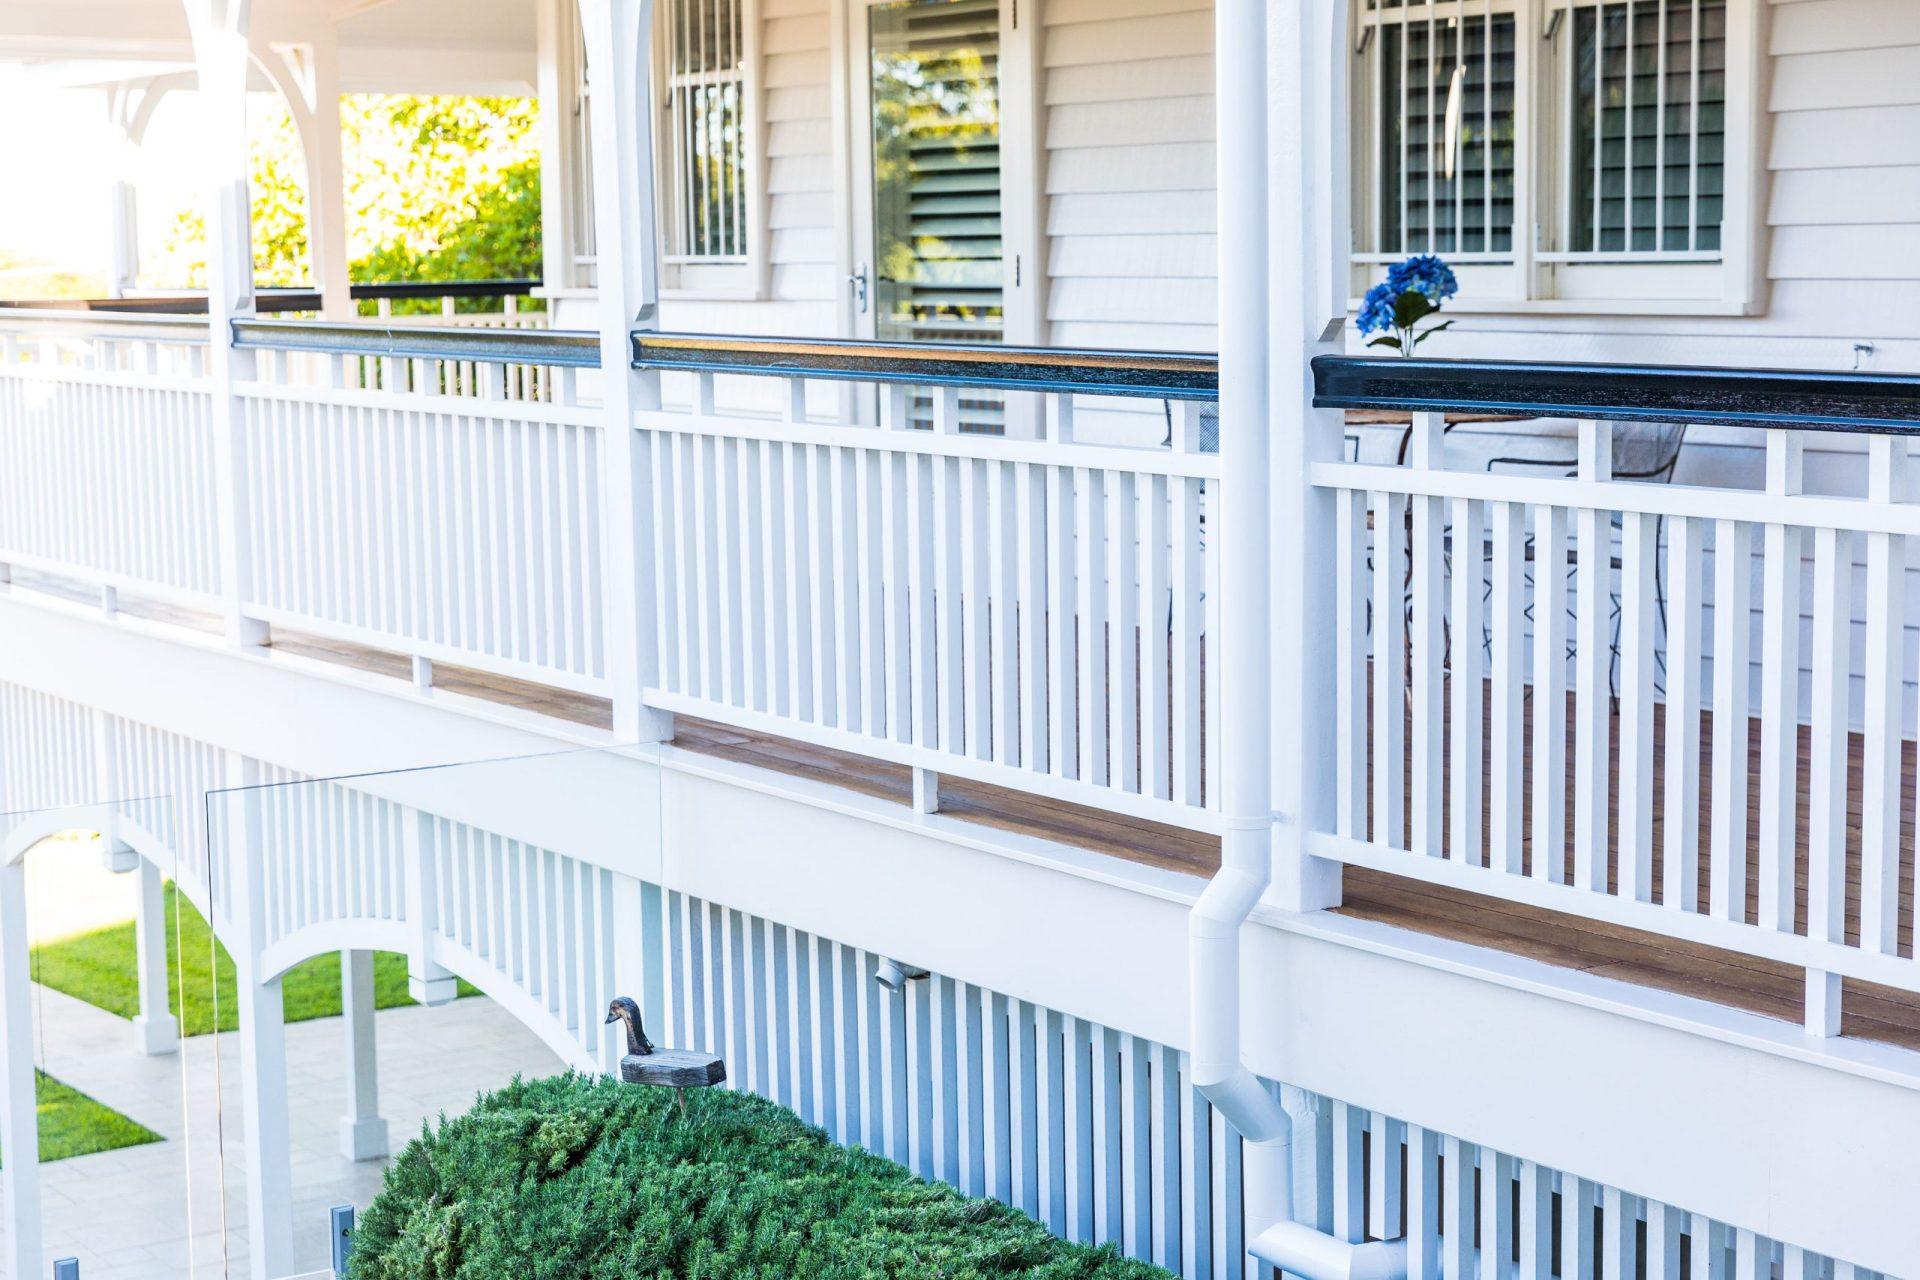 White wooden balcony fences